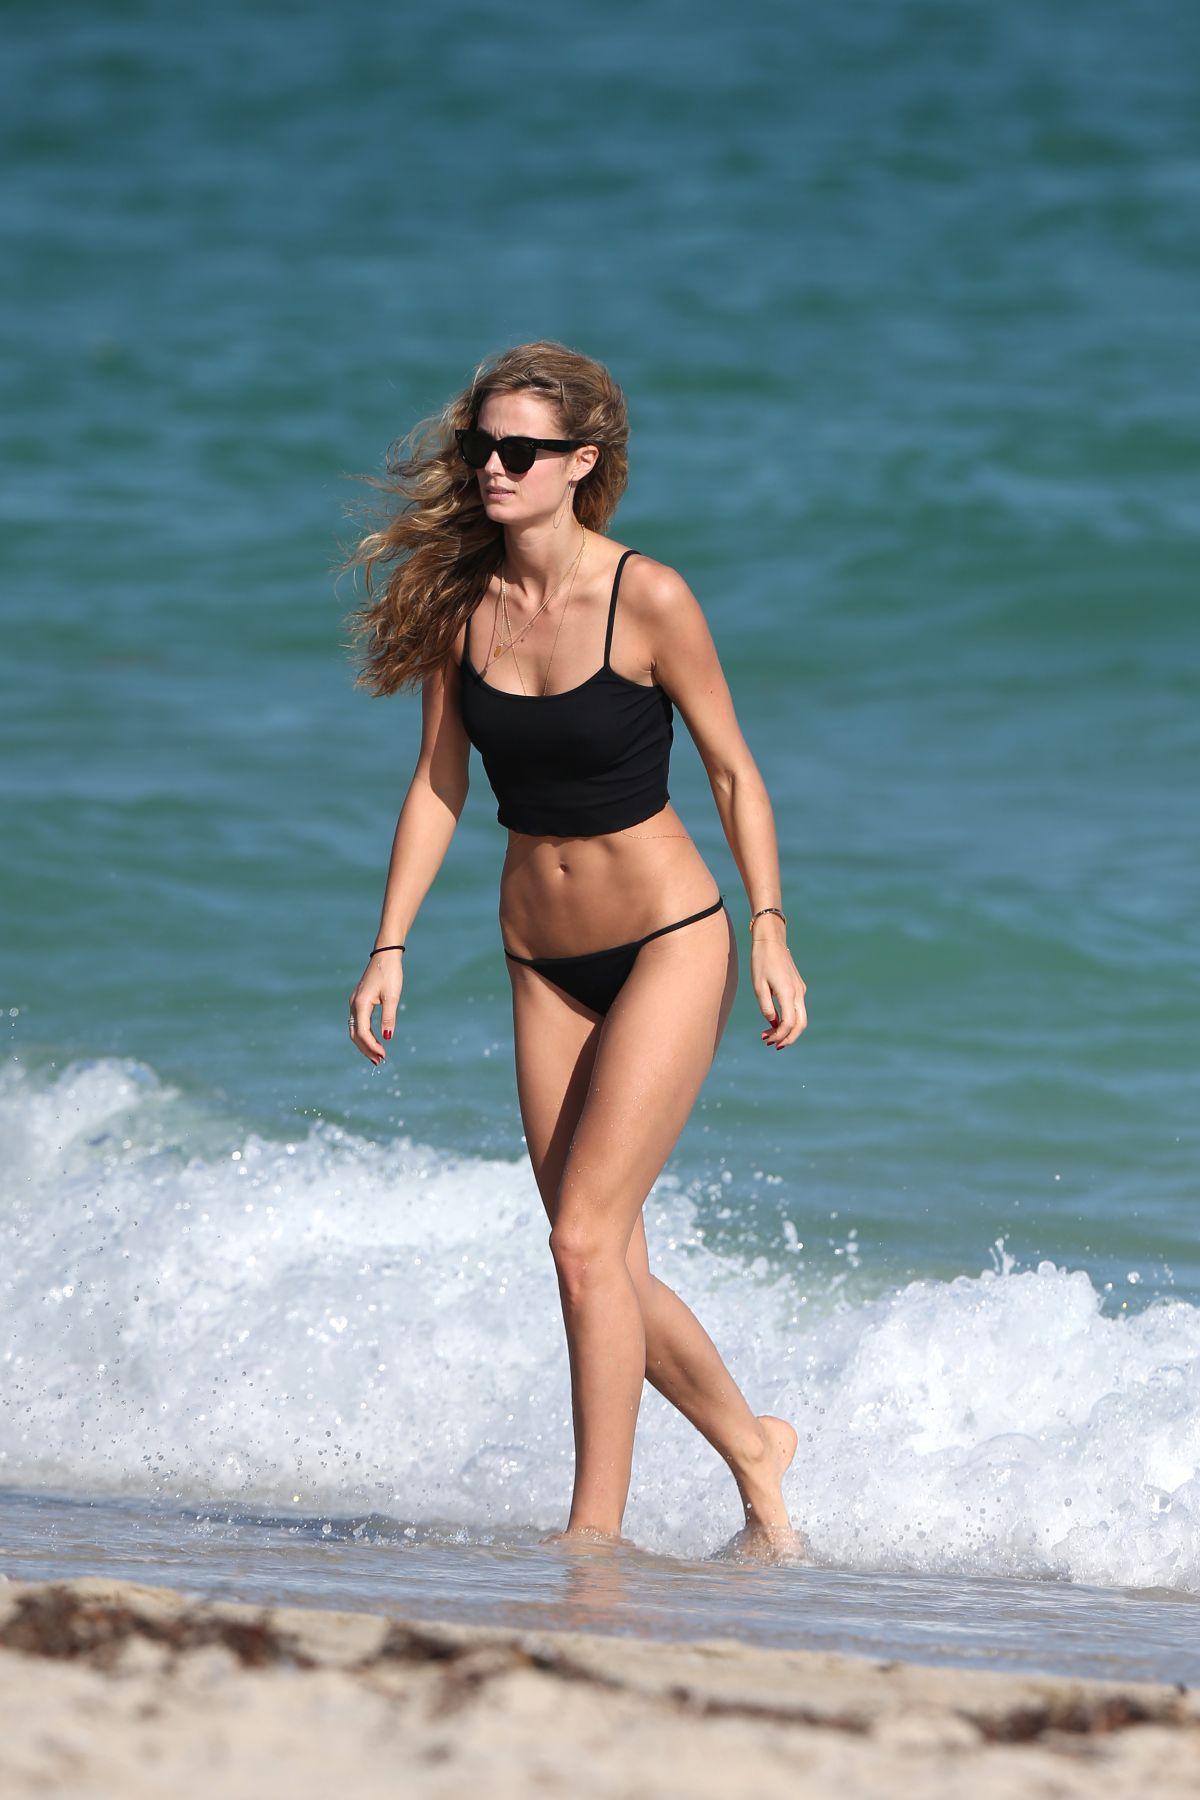 Kate Bock Bikini candids at the beach in Miami Beach Pic 28 of 35